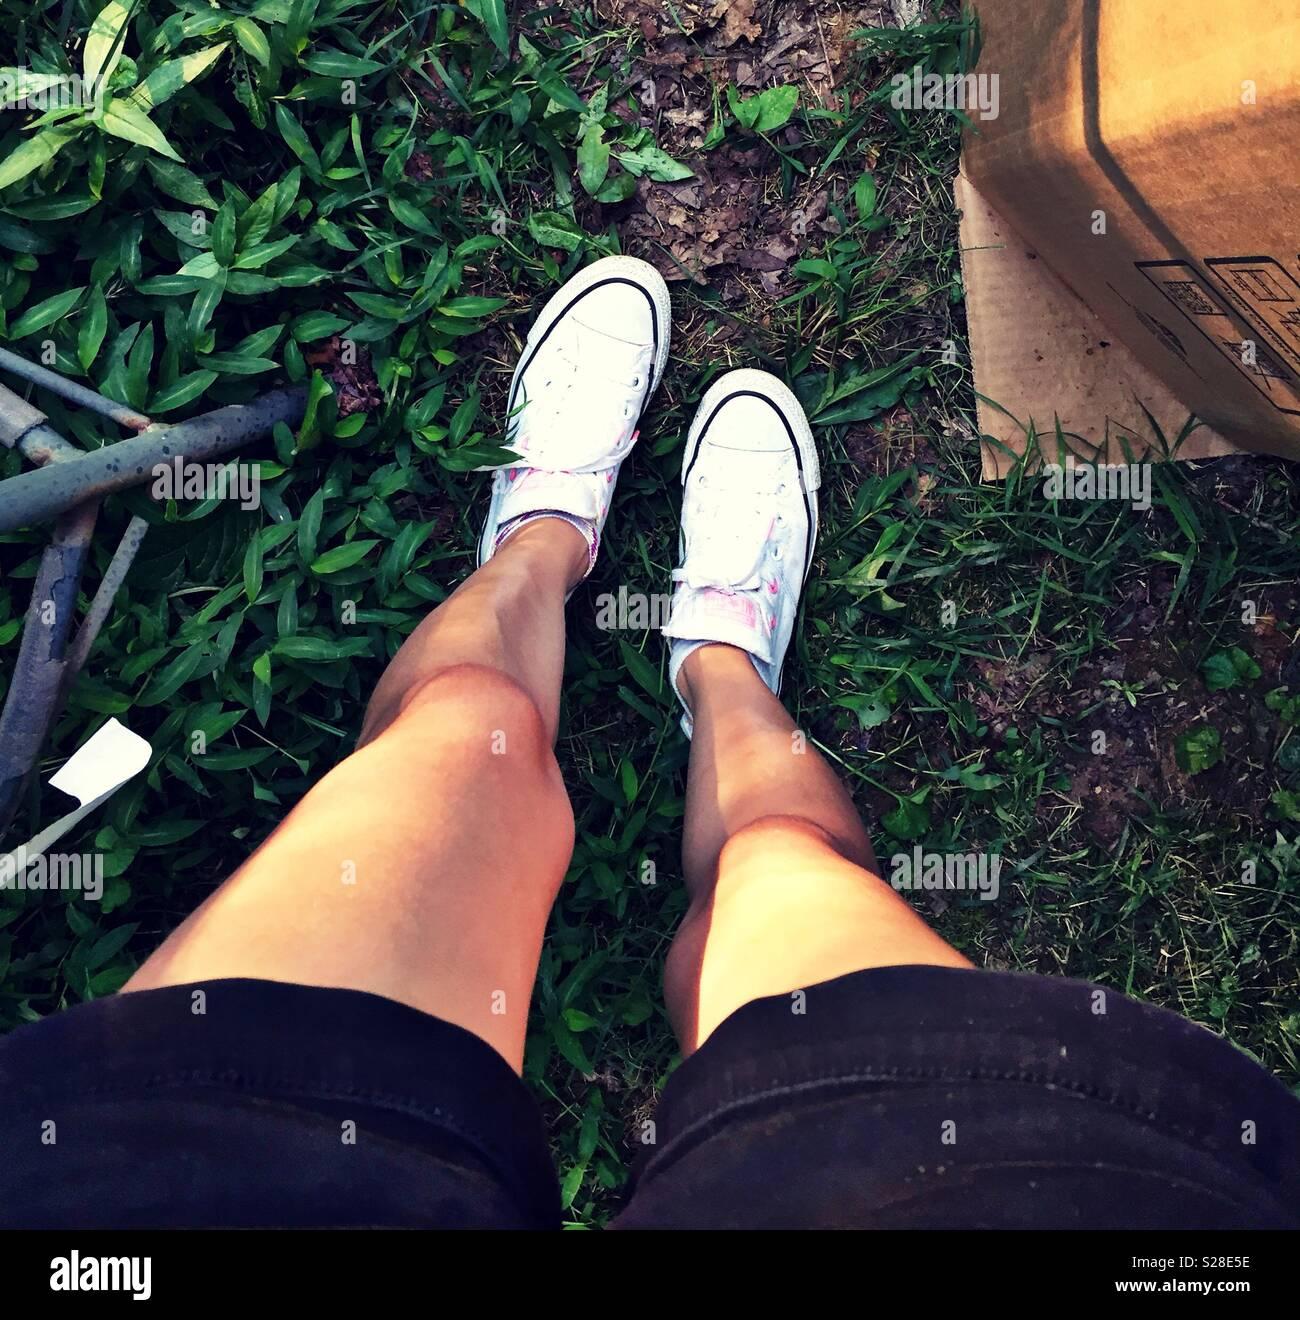 JASMINE: Tan legged juliet